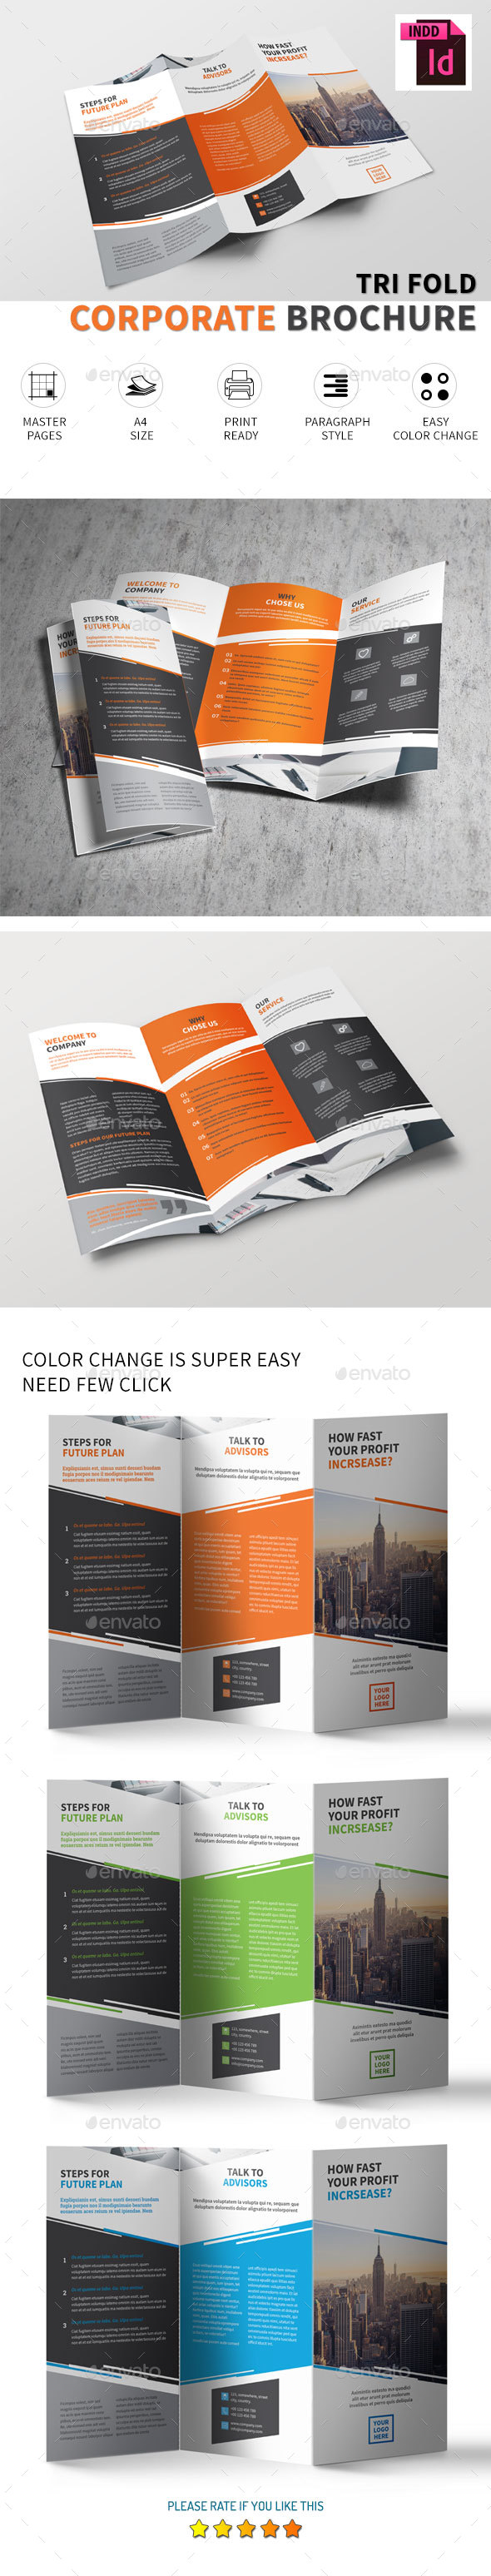 Tri-fold brochure Vol.4 - Corporate Brochures